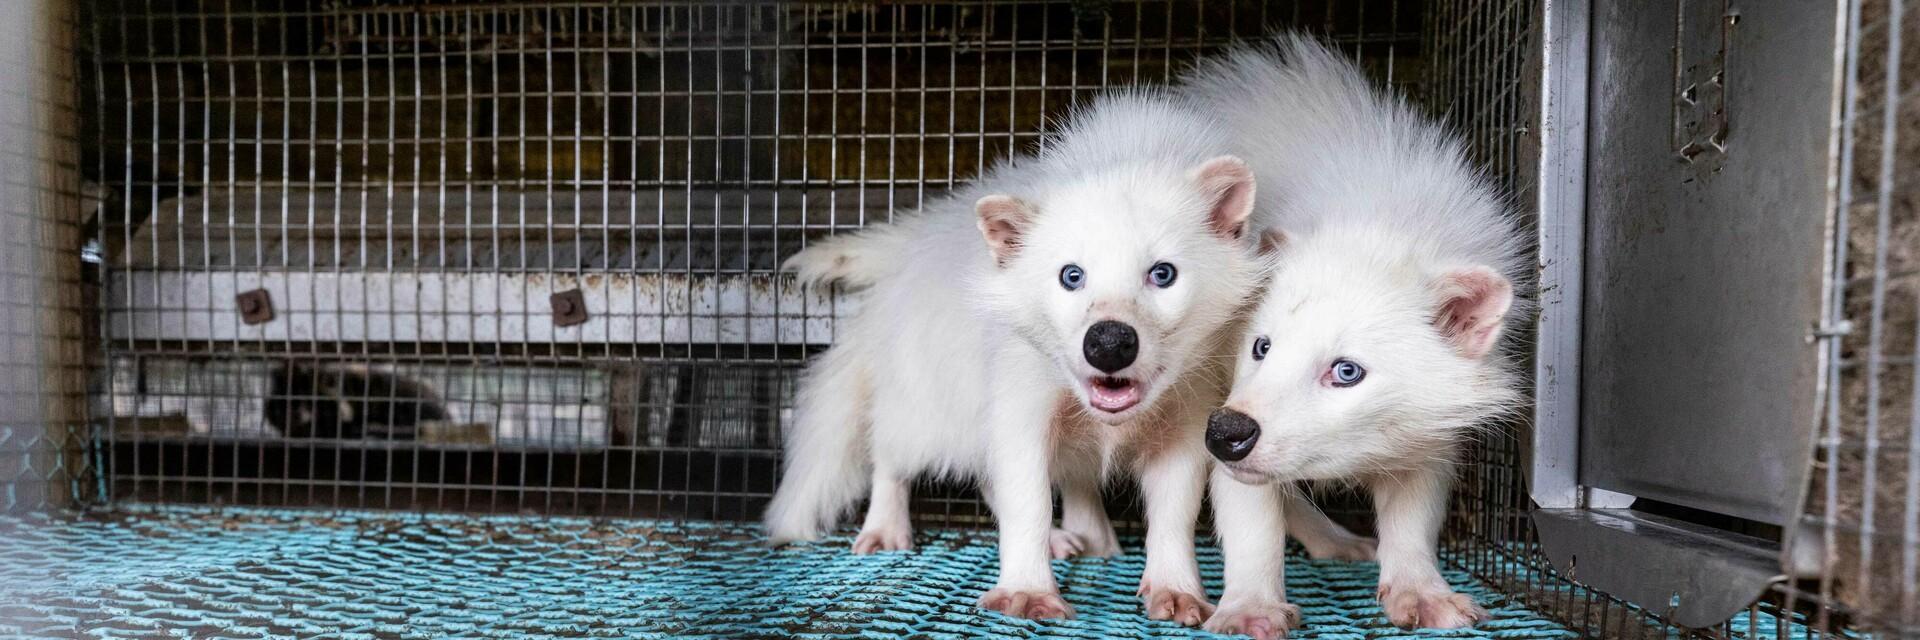 verängstigte Maderhunde auf Pelzfarm